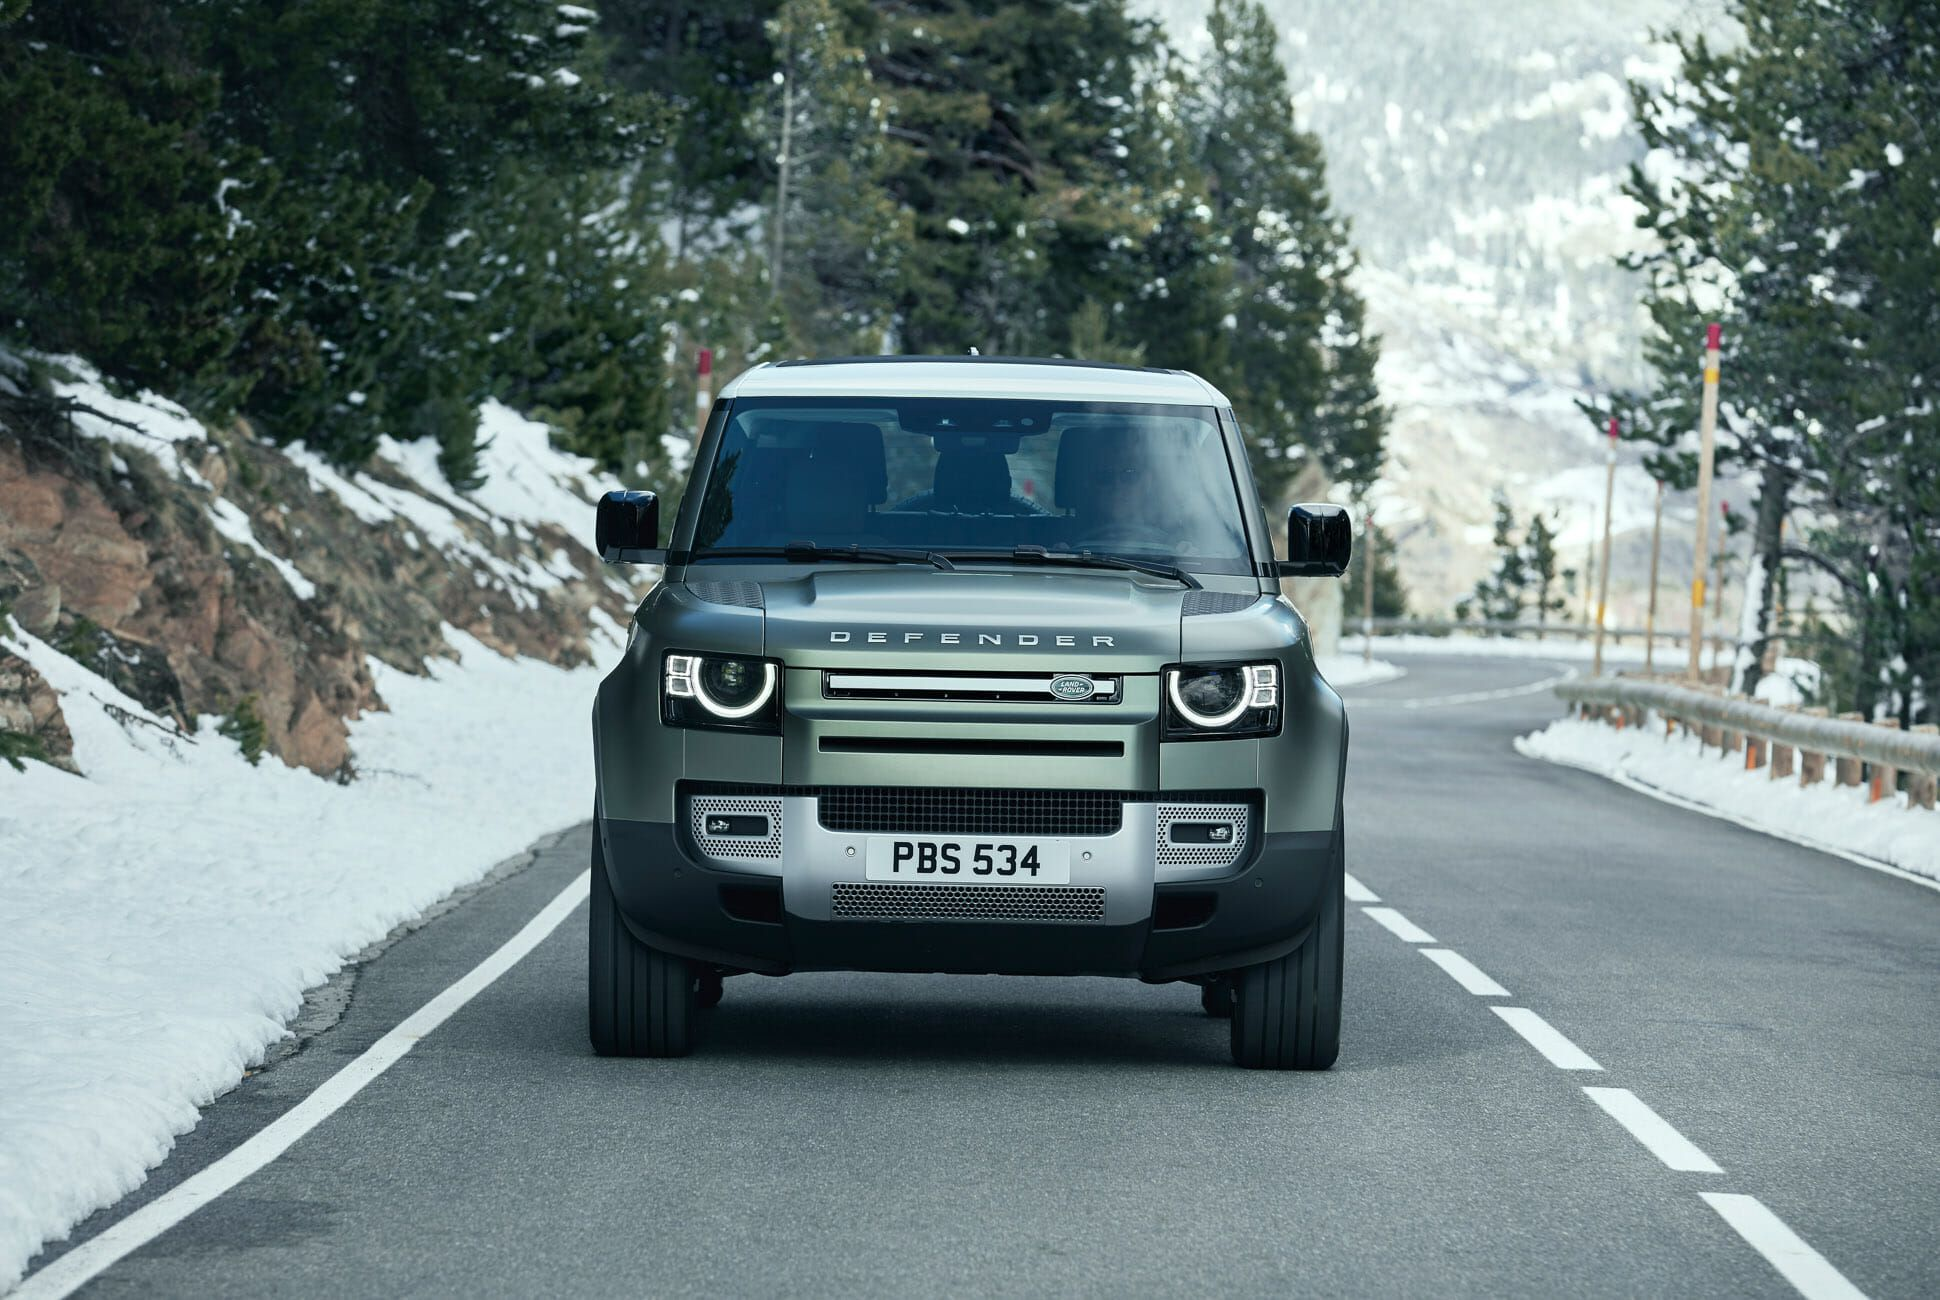 Land Rover Defender Gear Patrol-Exterior Action-Slide-05